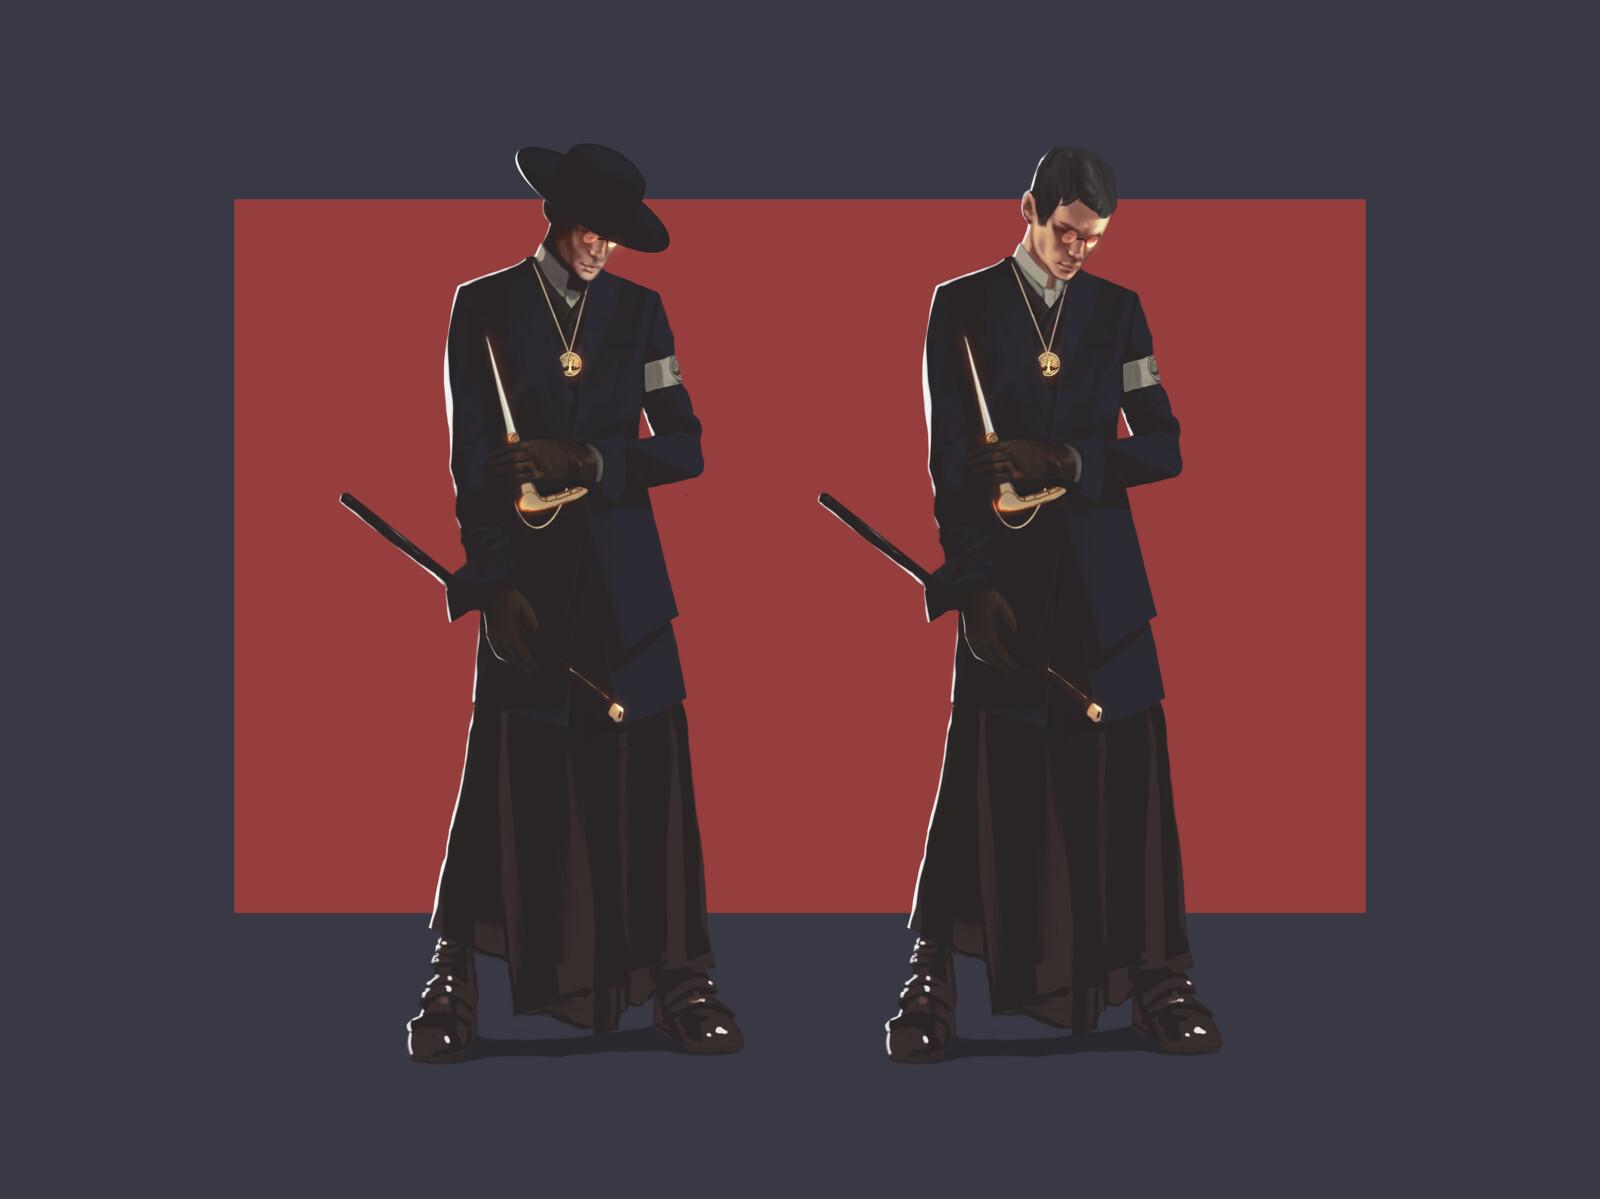 The Black Priest